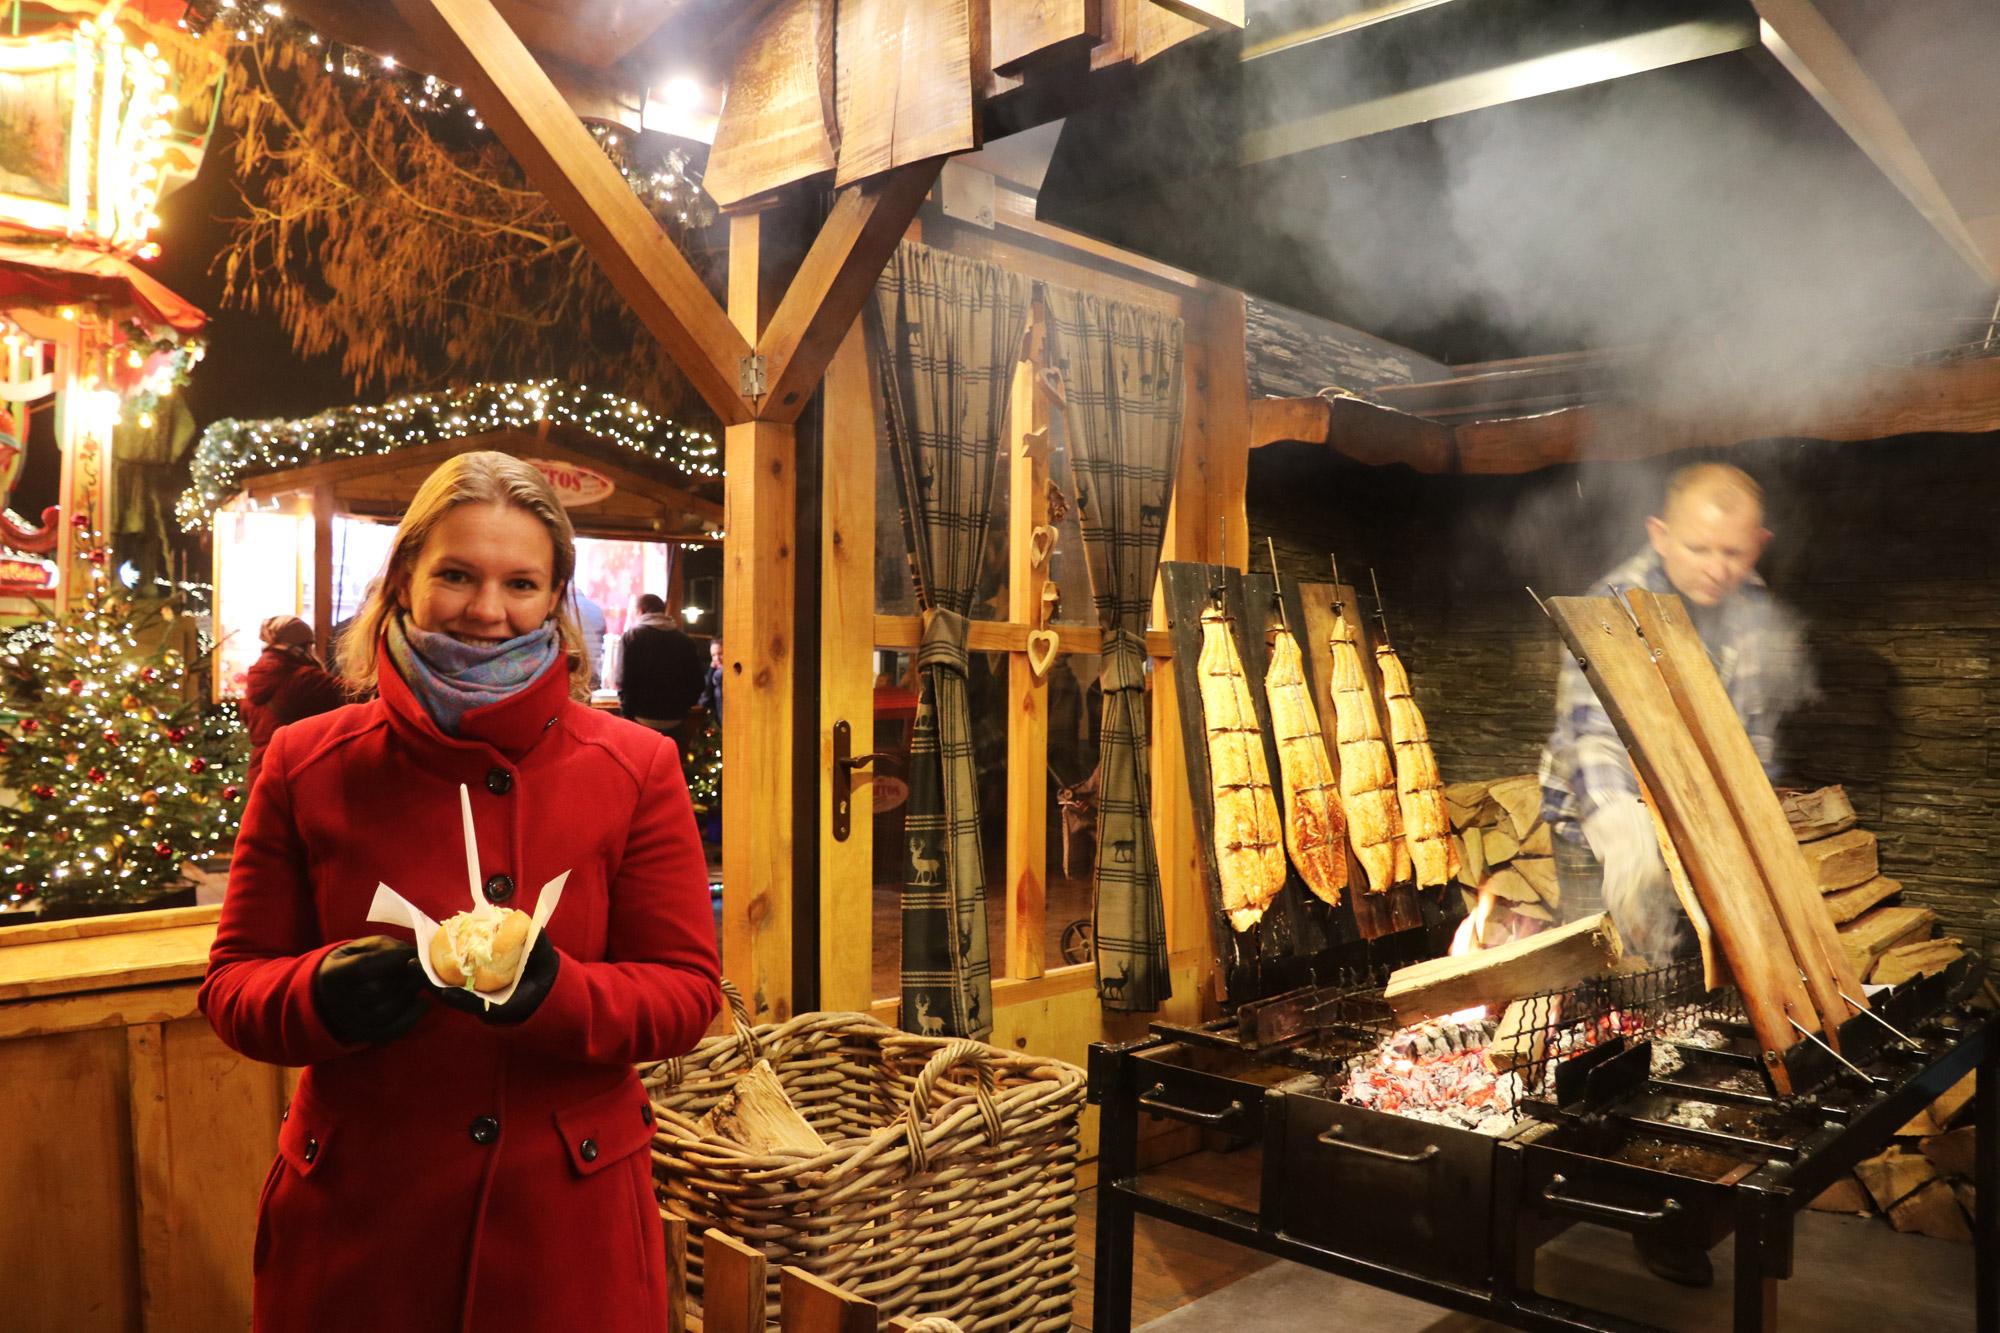 Bielefeld kerstmarkt - Broodje gerookte zalm